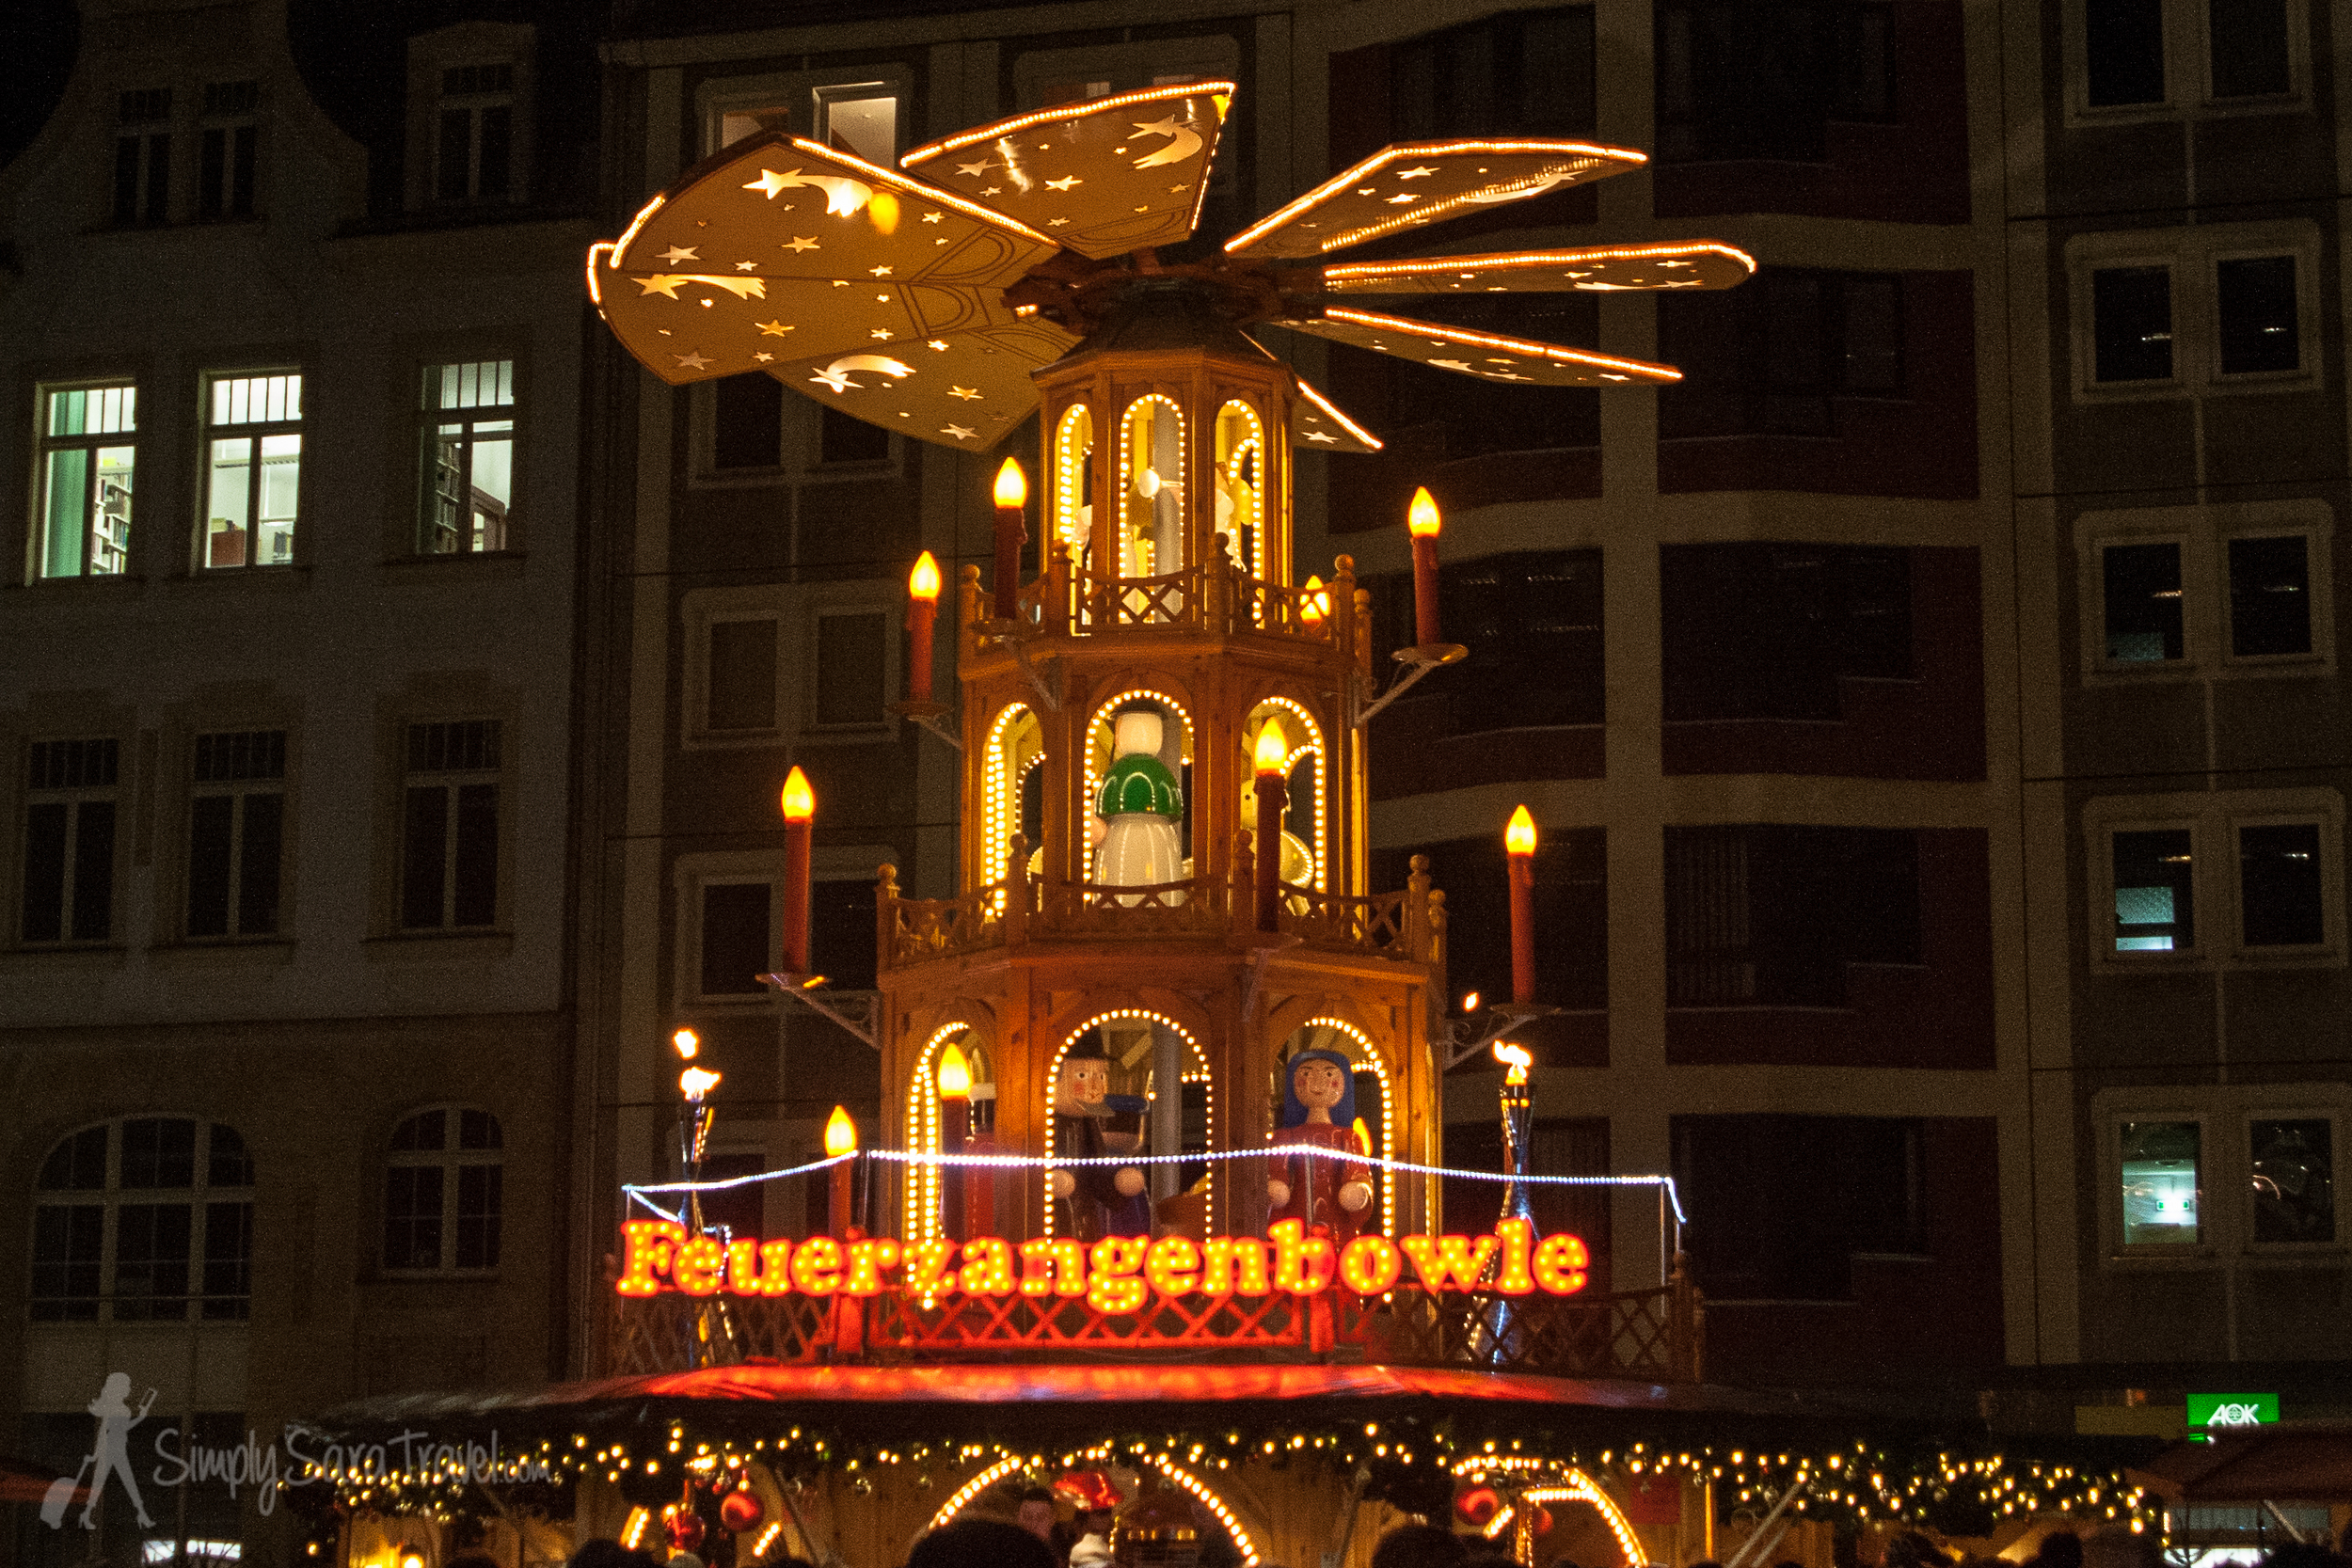 Christmas pyramid at night at Christmas market in Leipzig, Germany